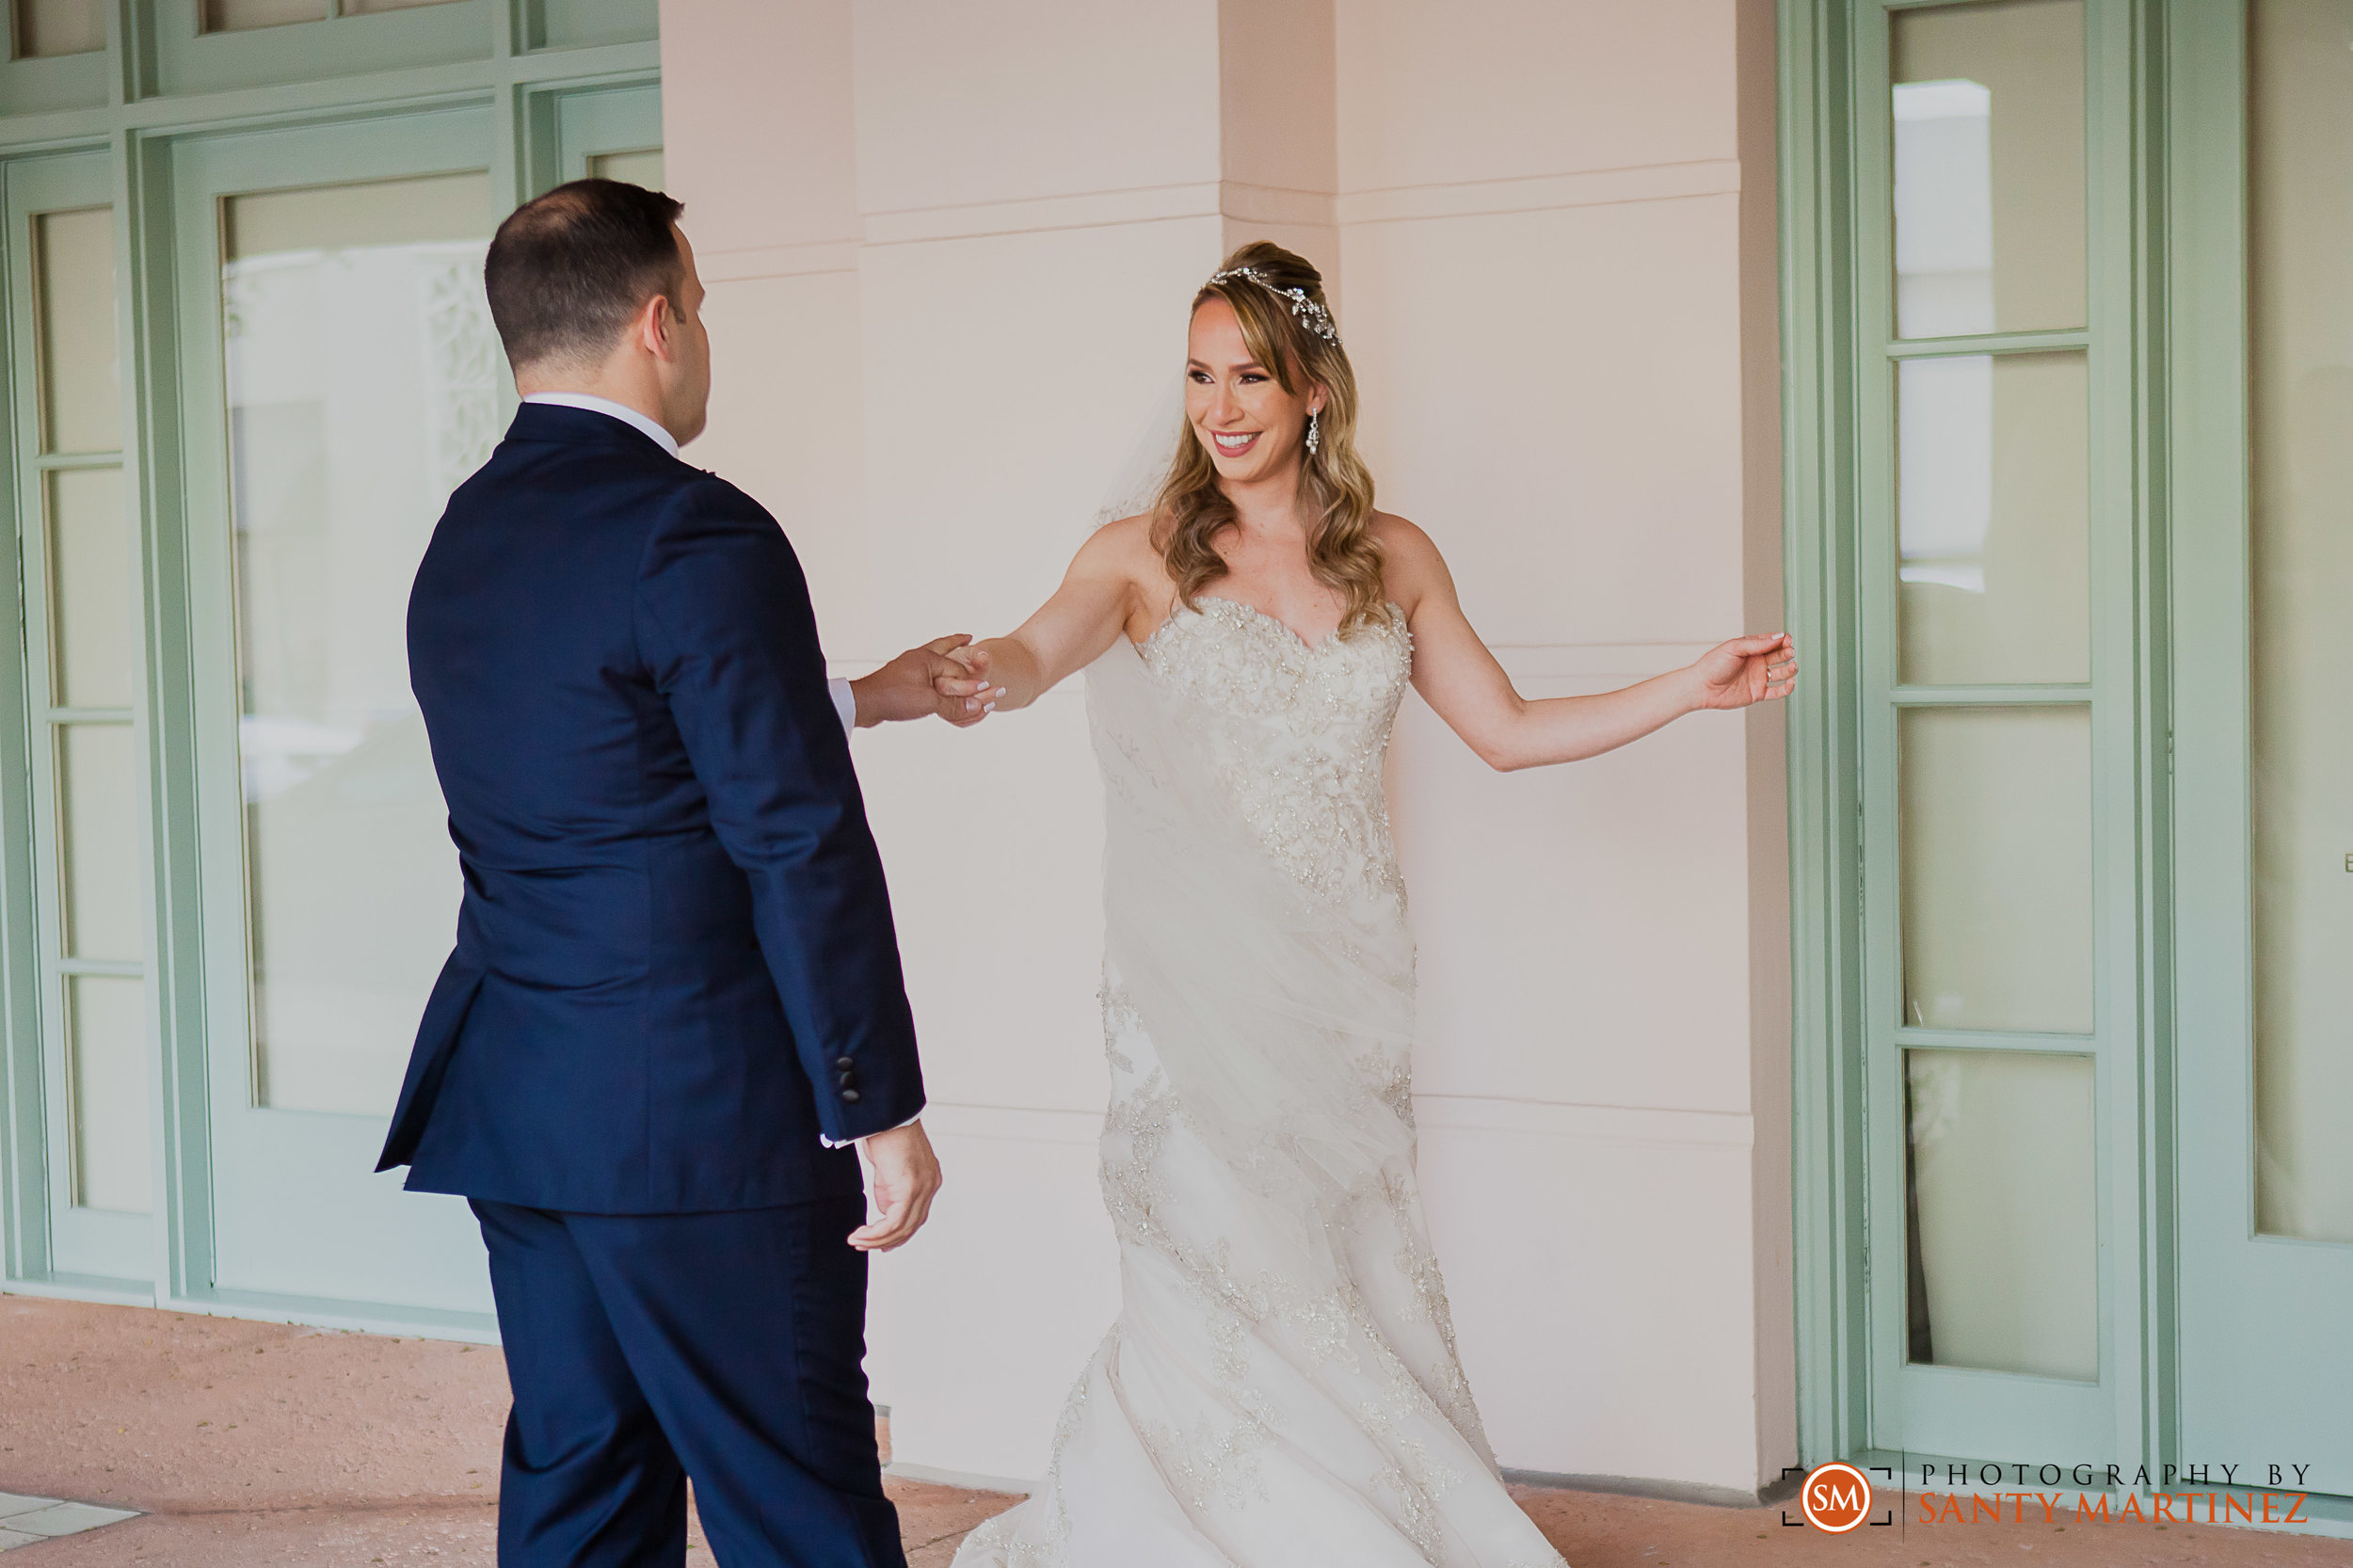 Wedding La Jolla Ballroom - Photography by Santy Martinez-15.jpg